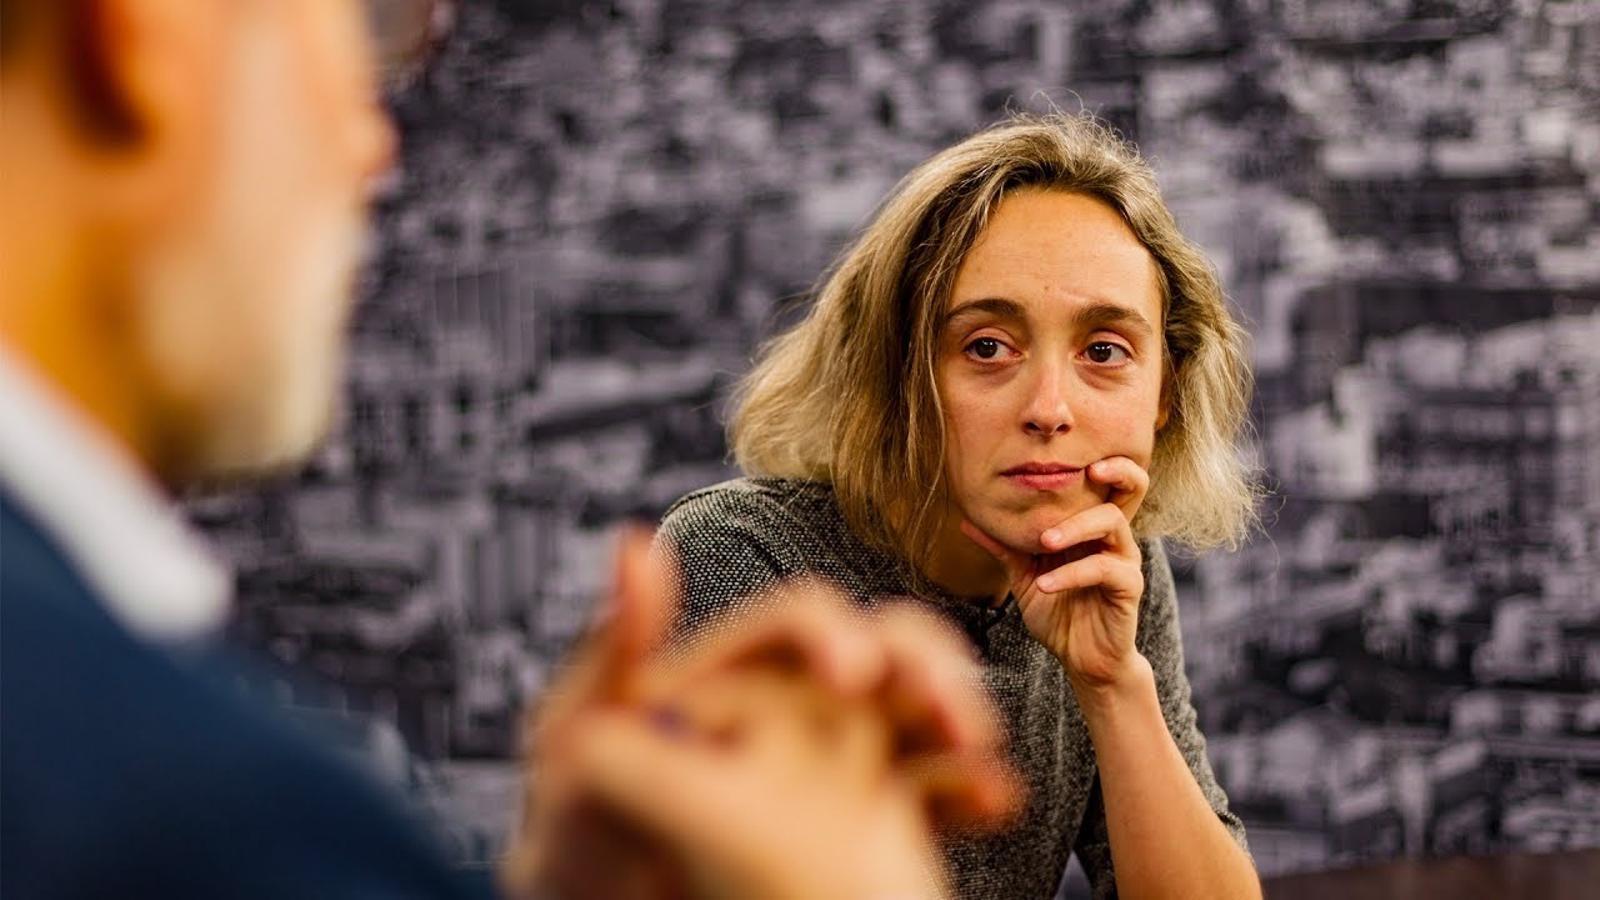 Entrevista d'Antoni Bassas a Ingrid Guardiola